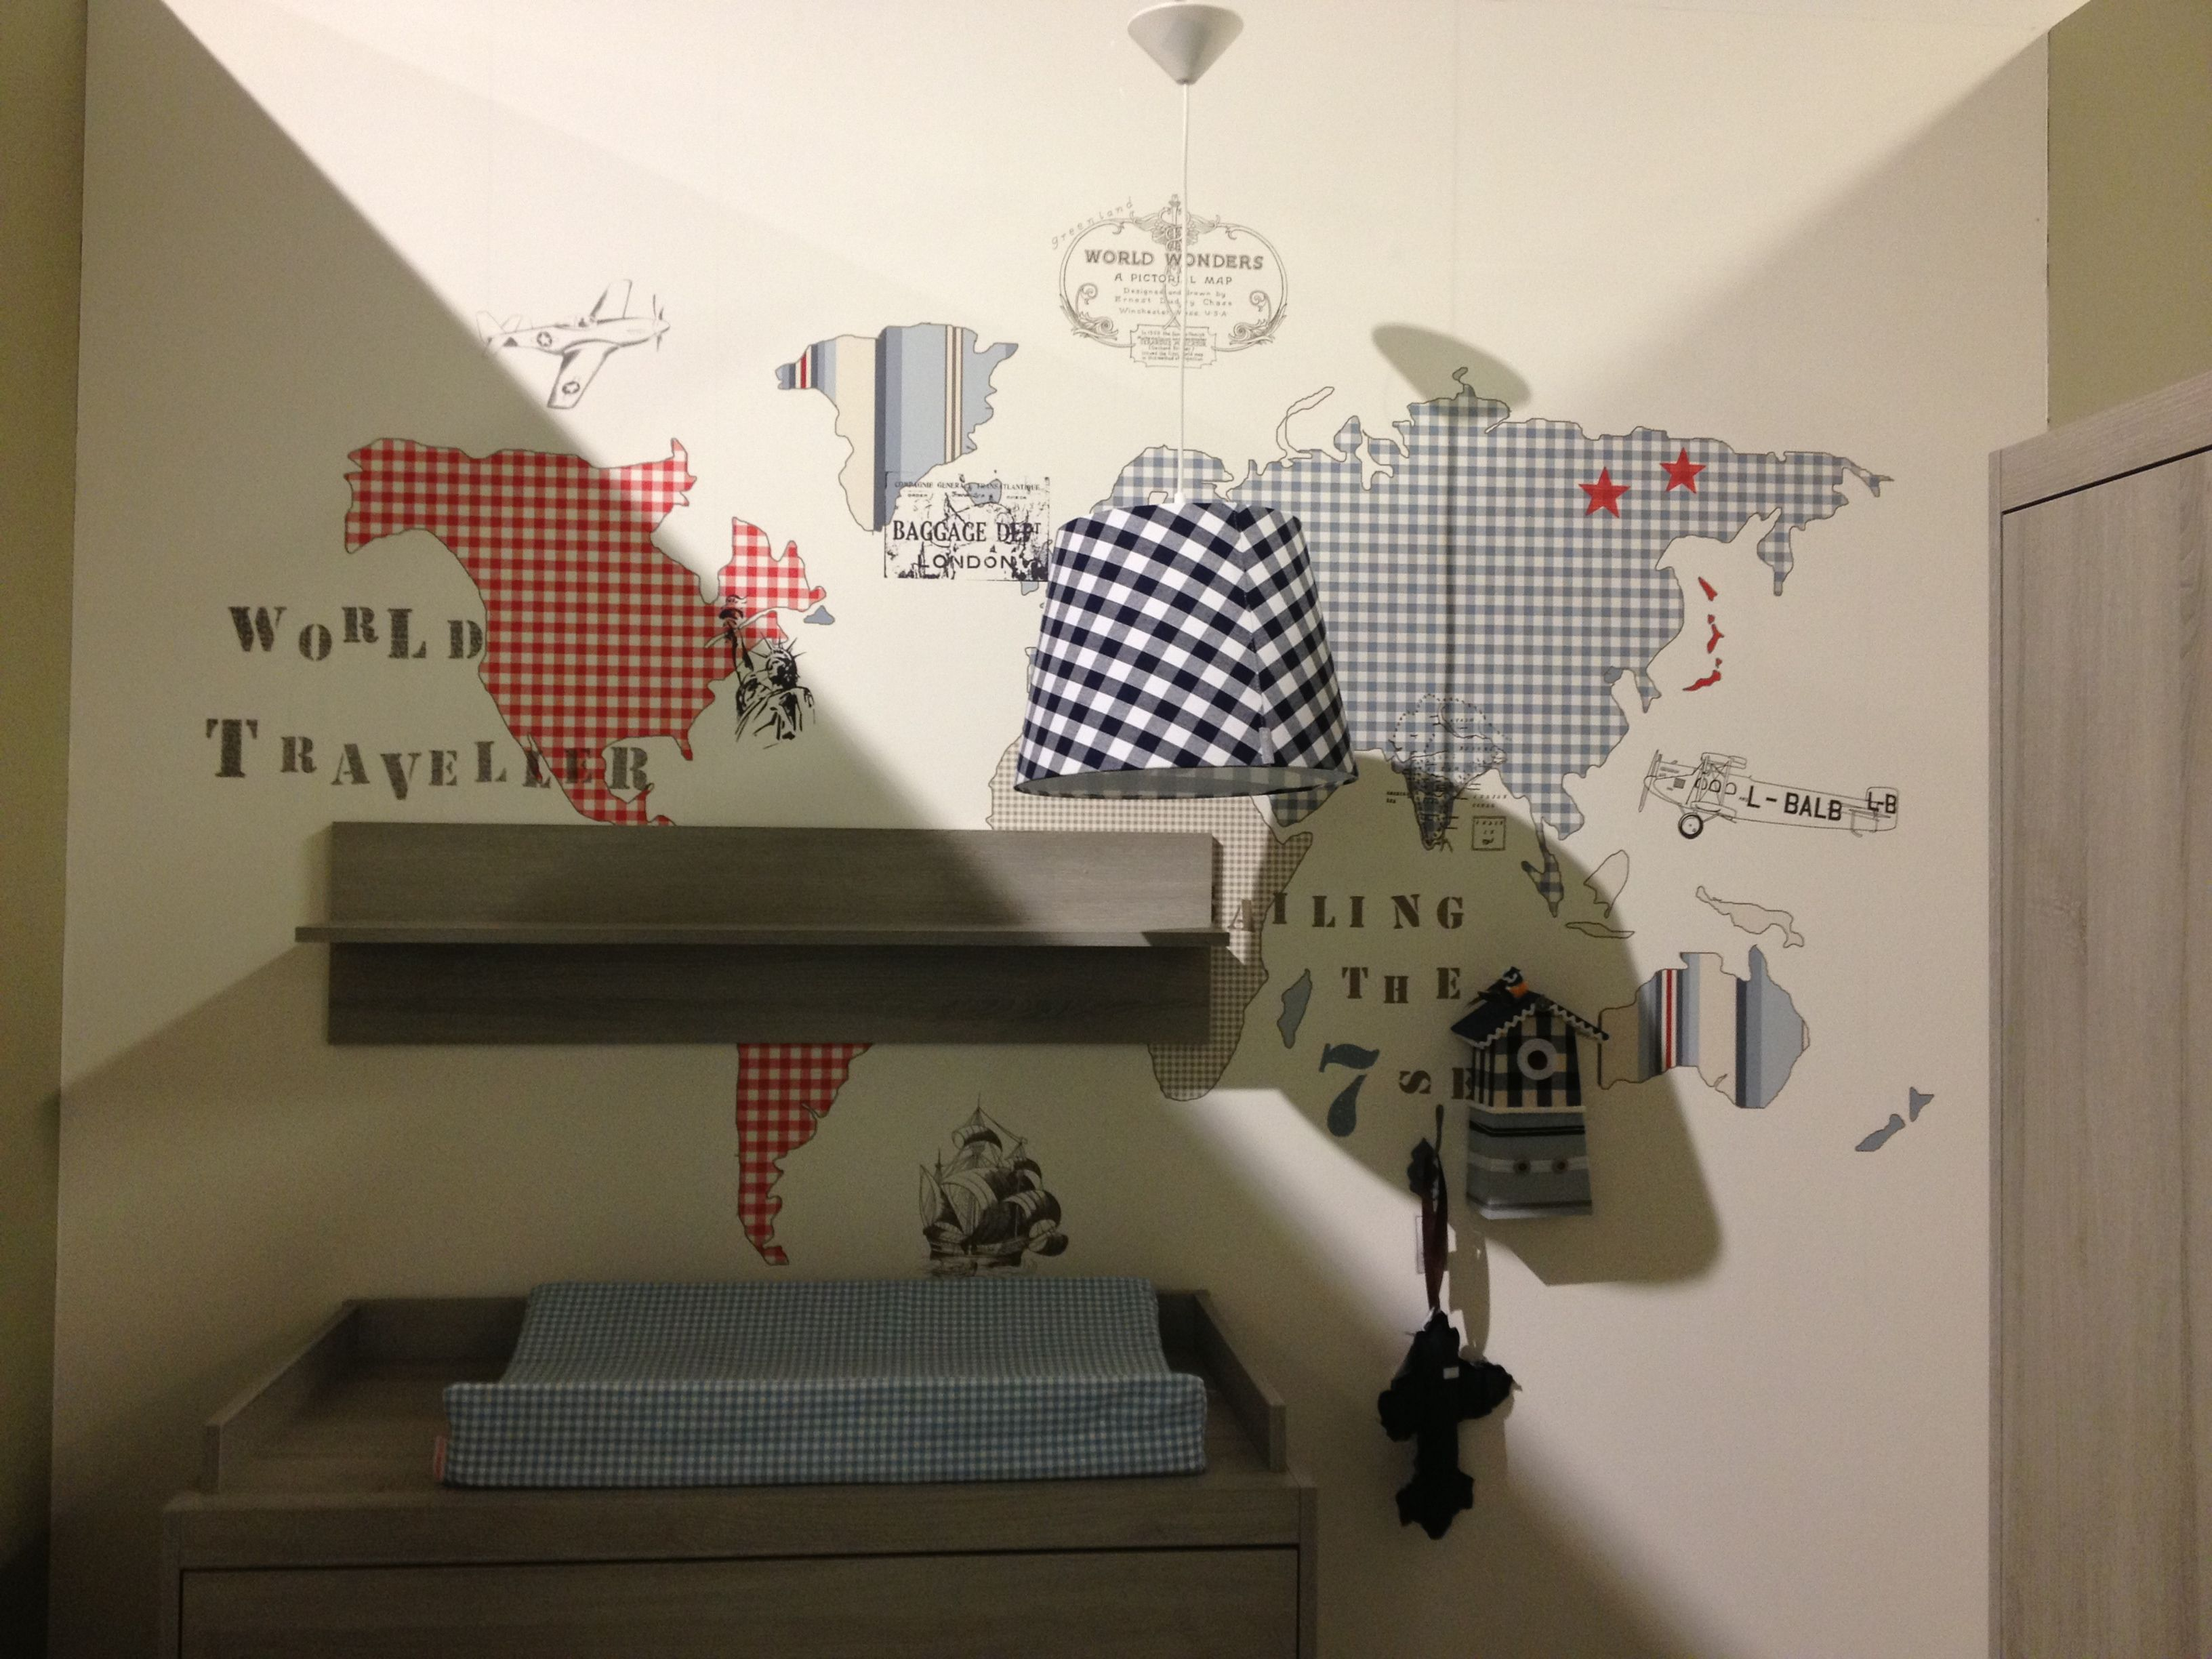 Kinderkamer Behang Vogelhuisjes : World traveller behang inspiratie babykamer